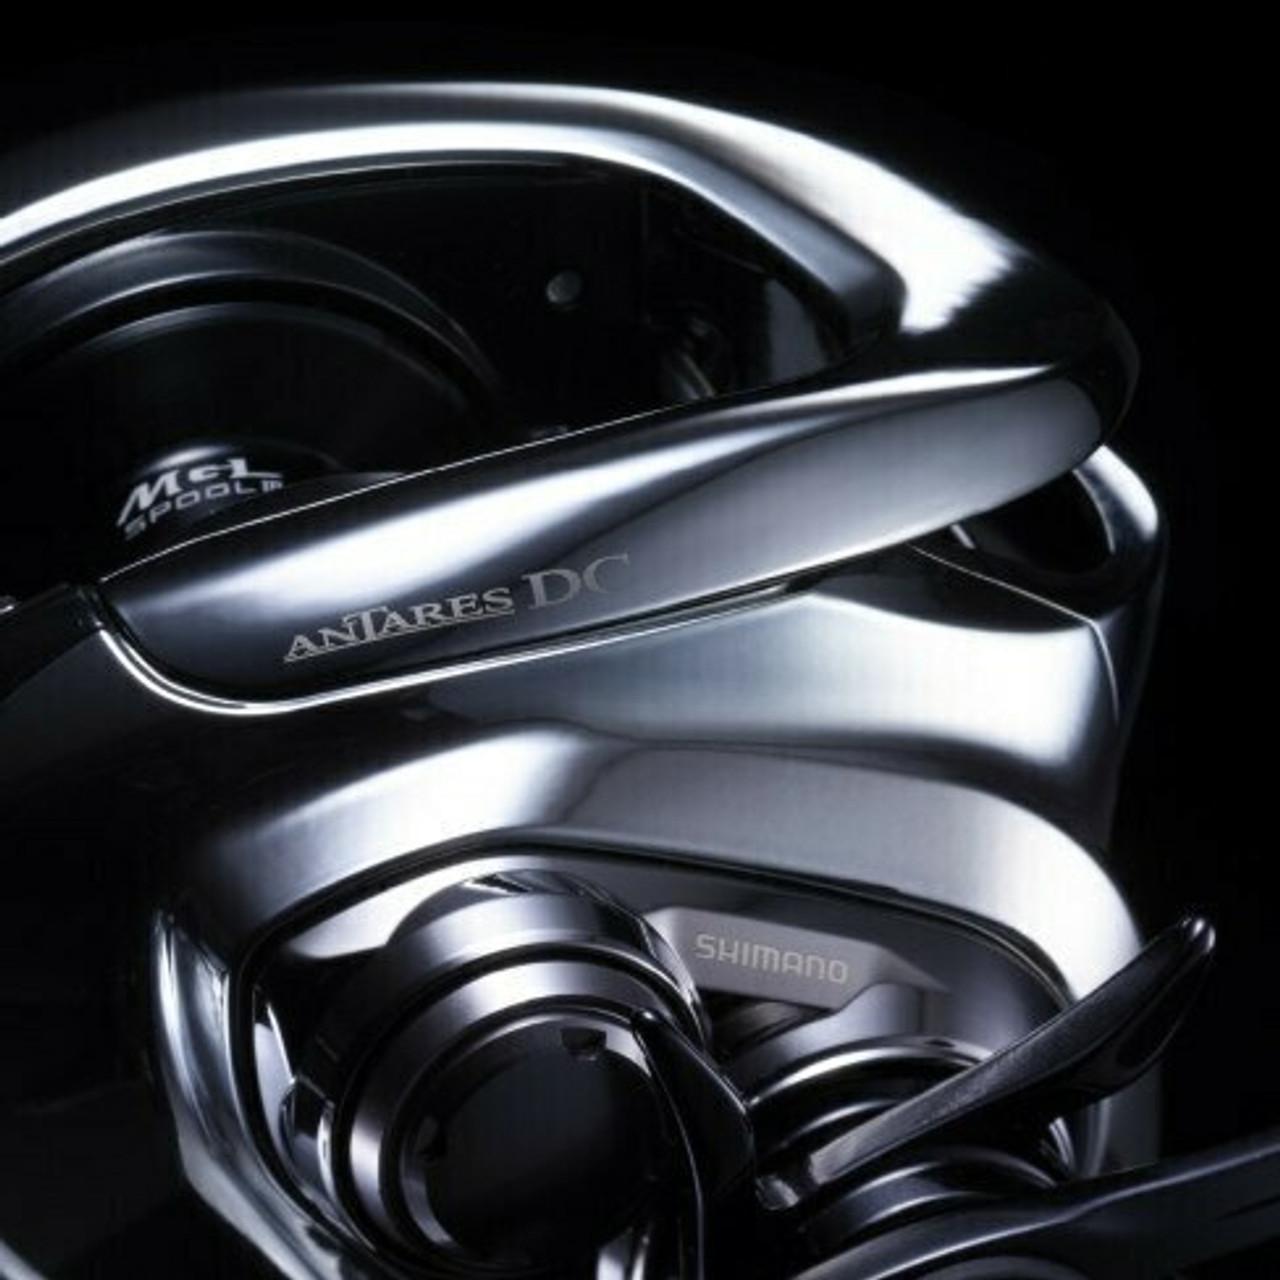 Shimano 21 ANTARES DC XG R Right Handle NEW